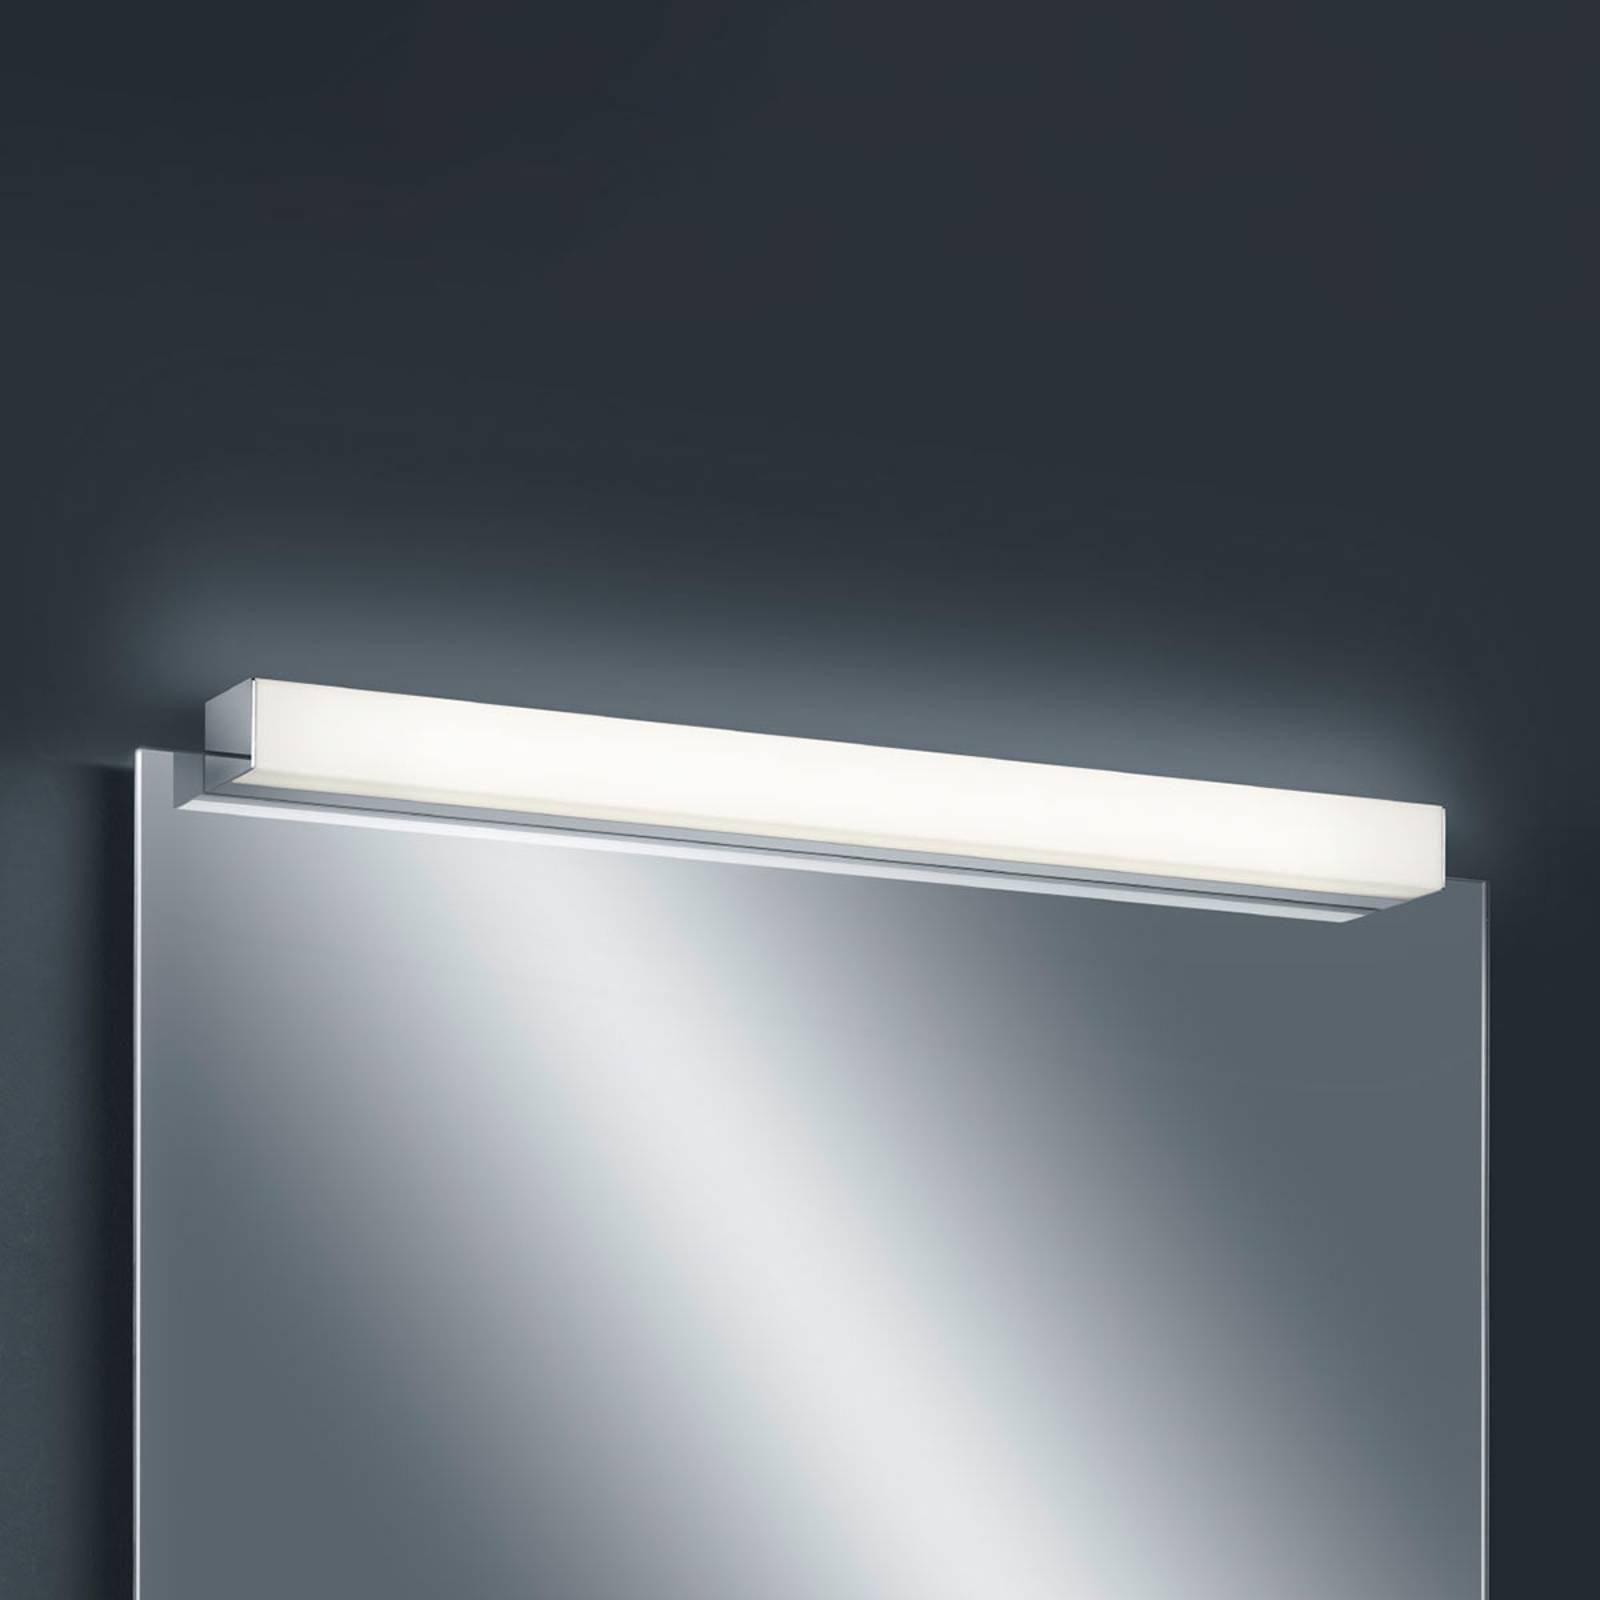 Helestra Lado – LED-speillampe 60 cm